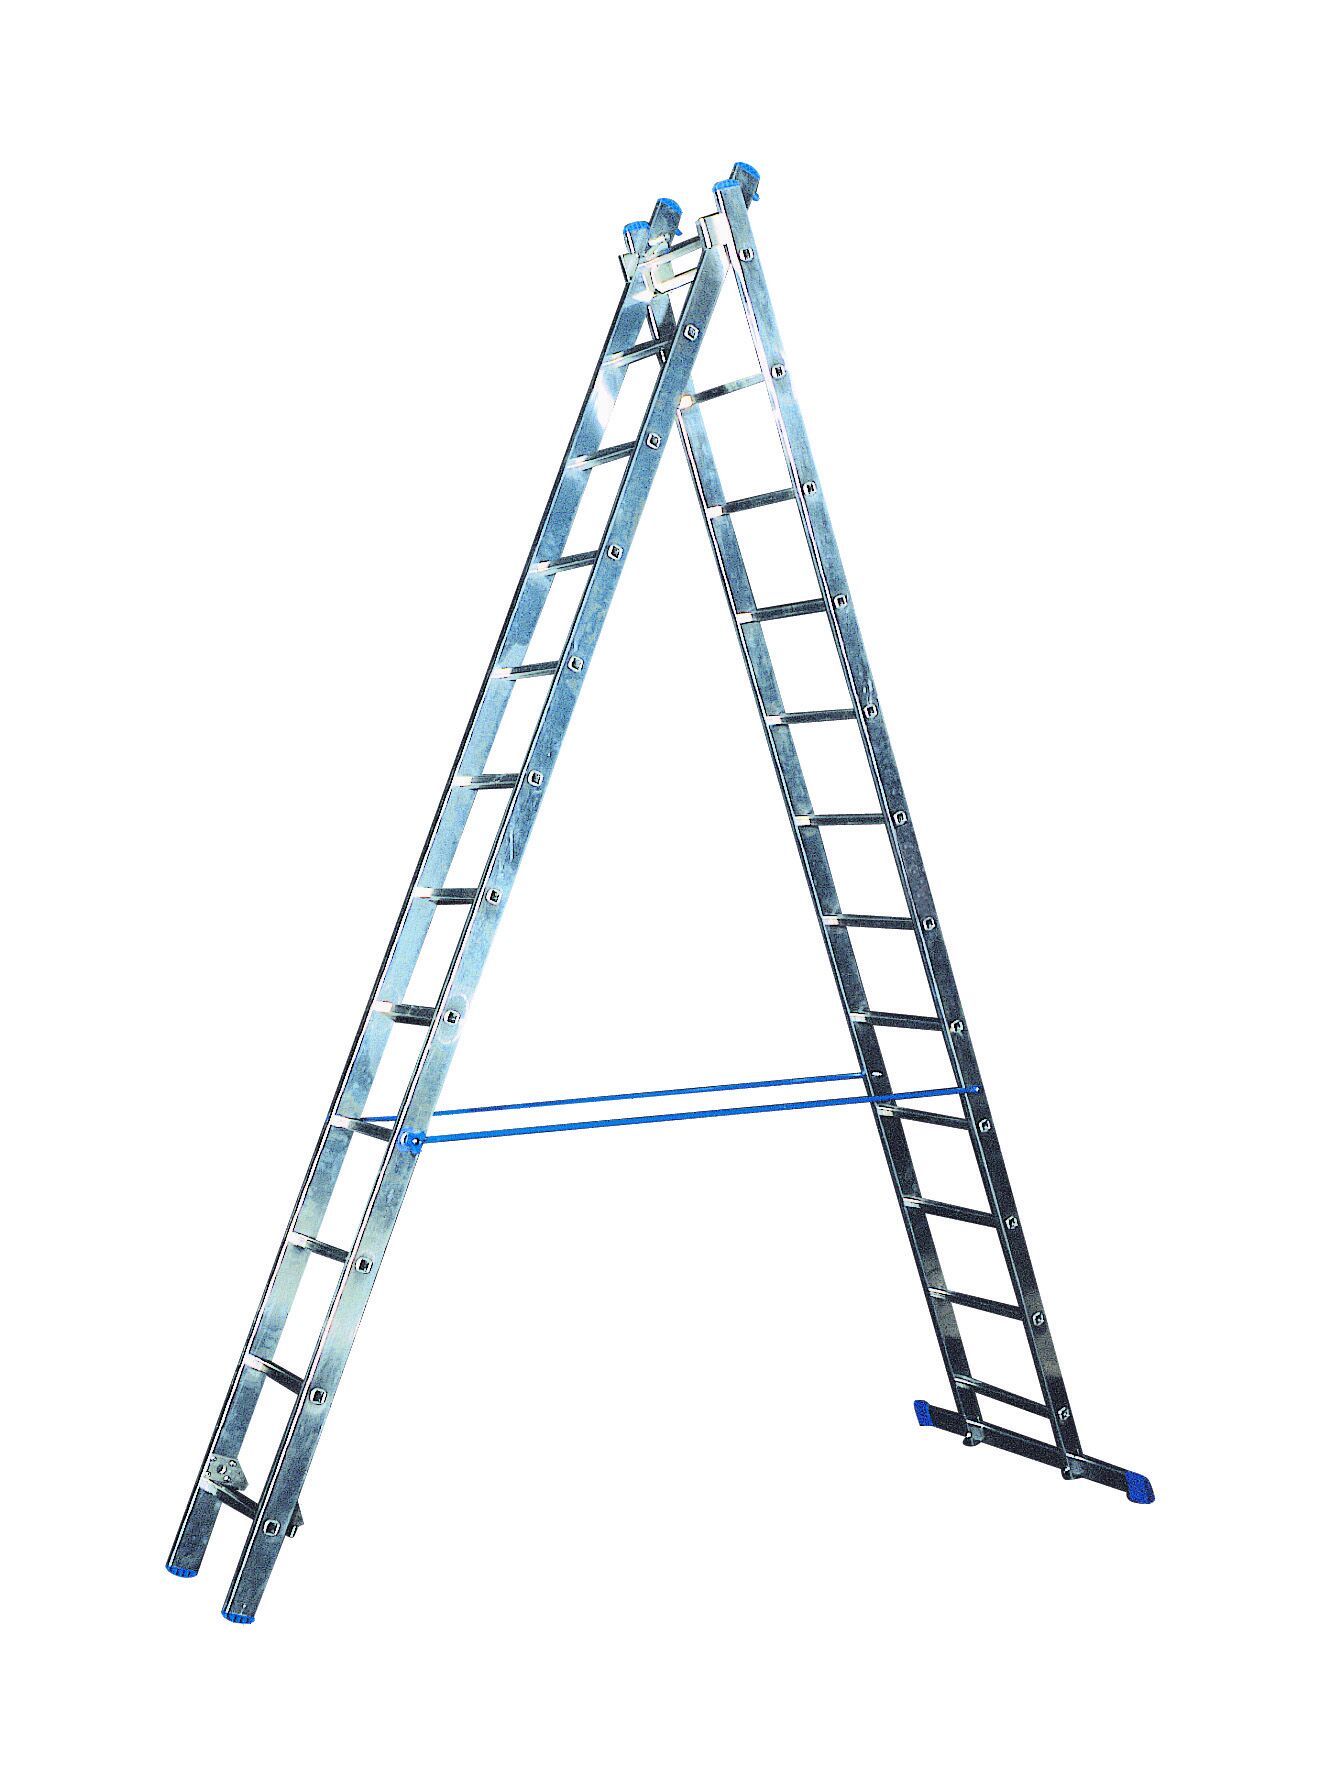 Žebřík hliníkový víceučelový HOBBY VHR H 2x7 Al